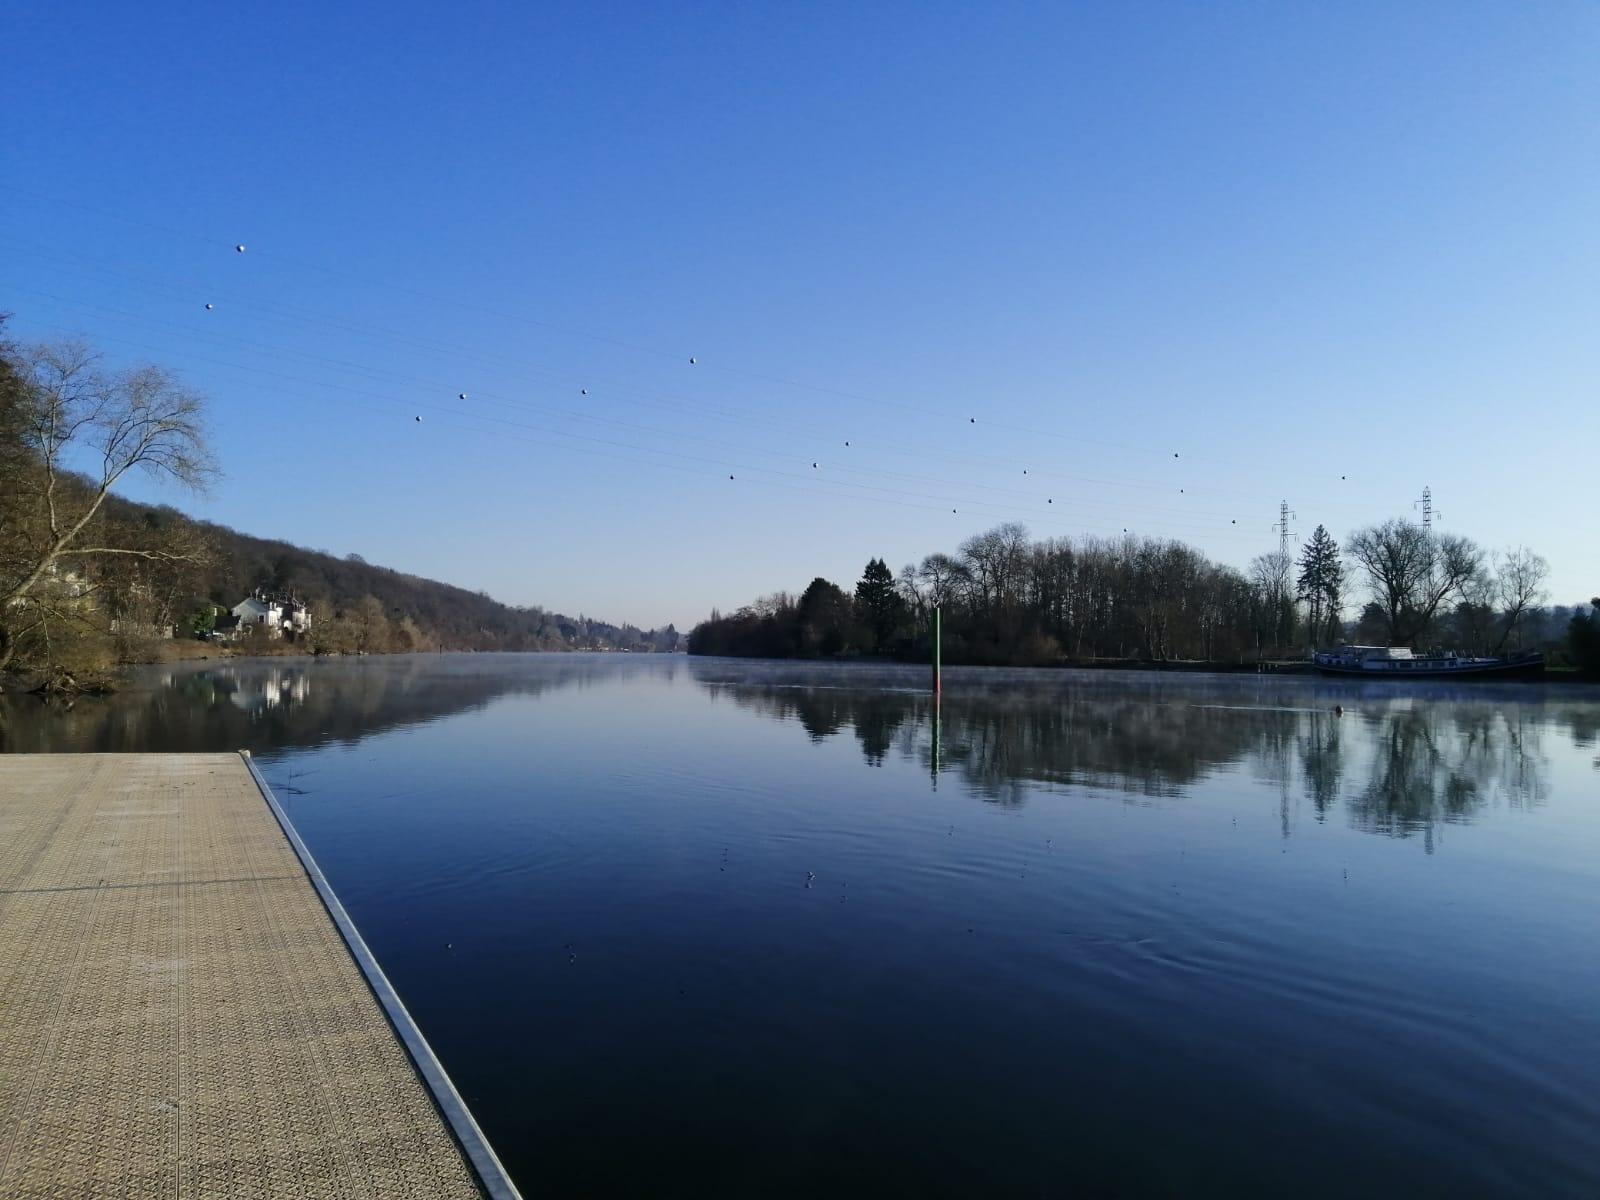 la Seine vue du ponton de l'ANFA